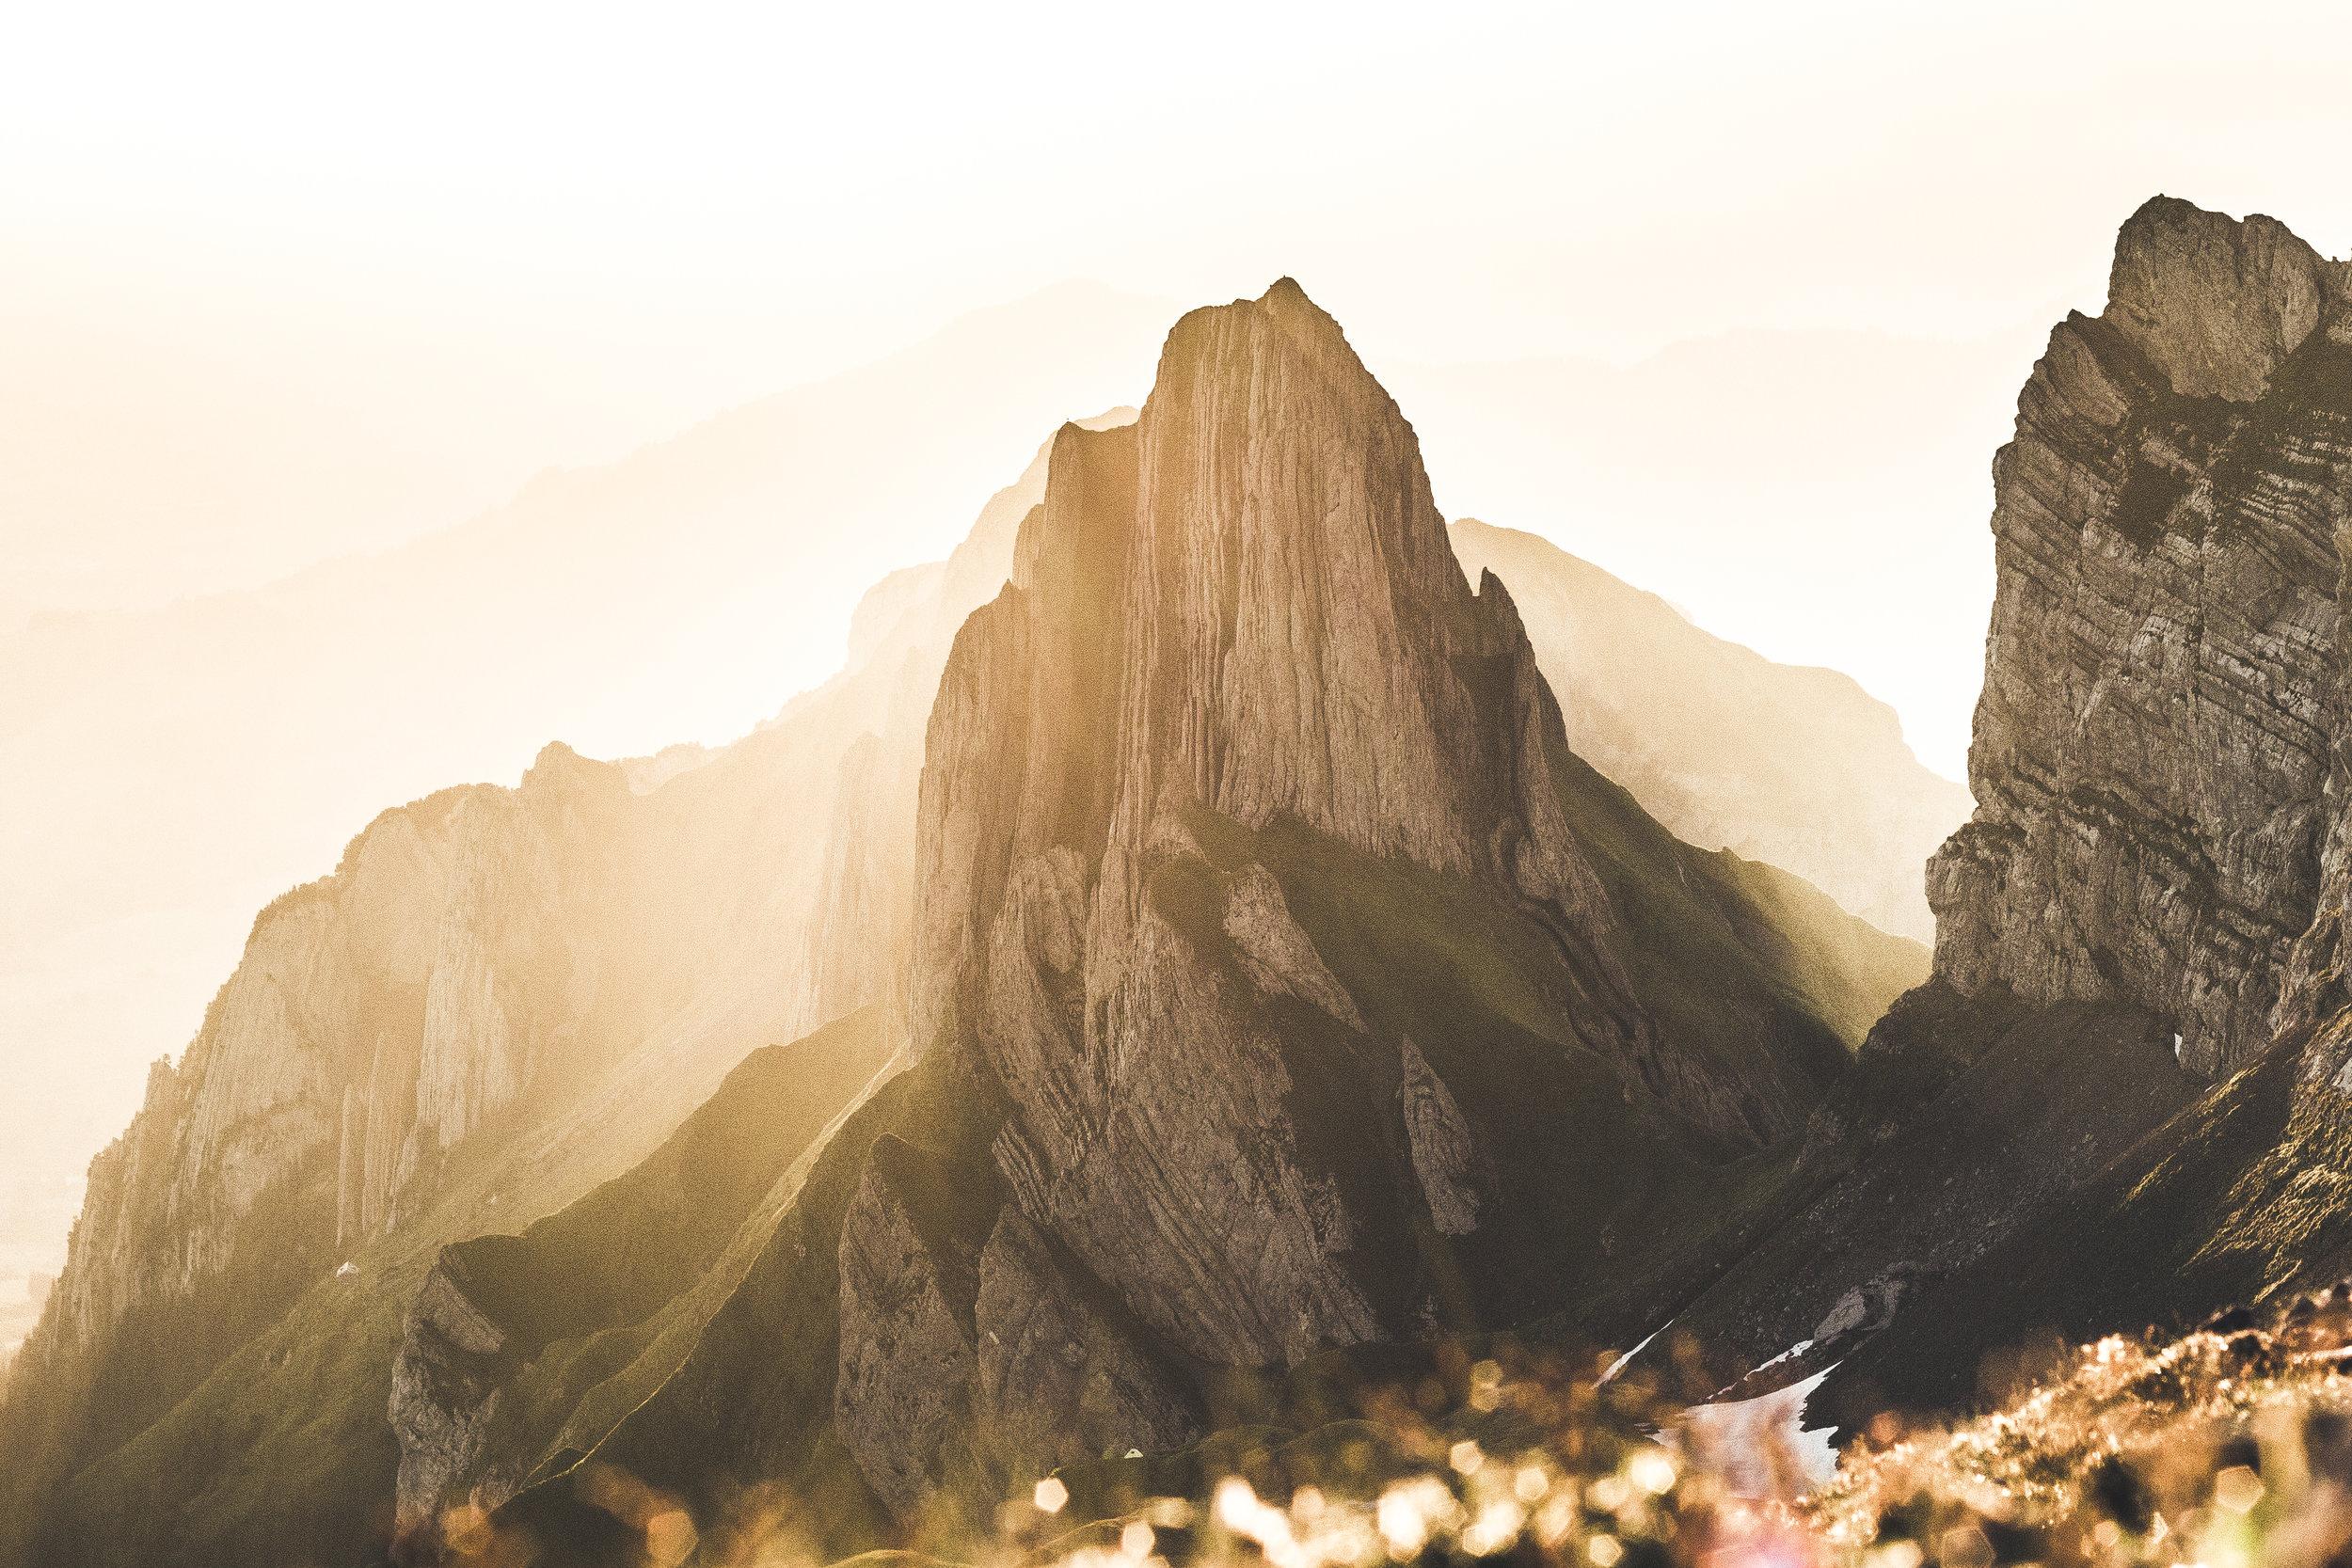 Altenalptürme | Appenzell, Switzerland